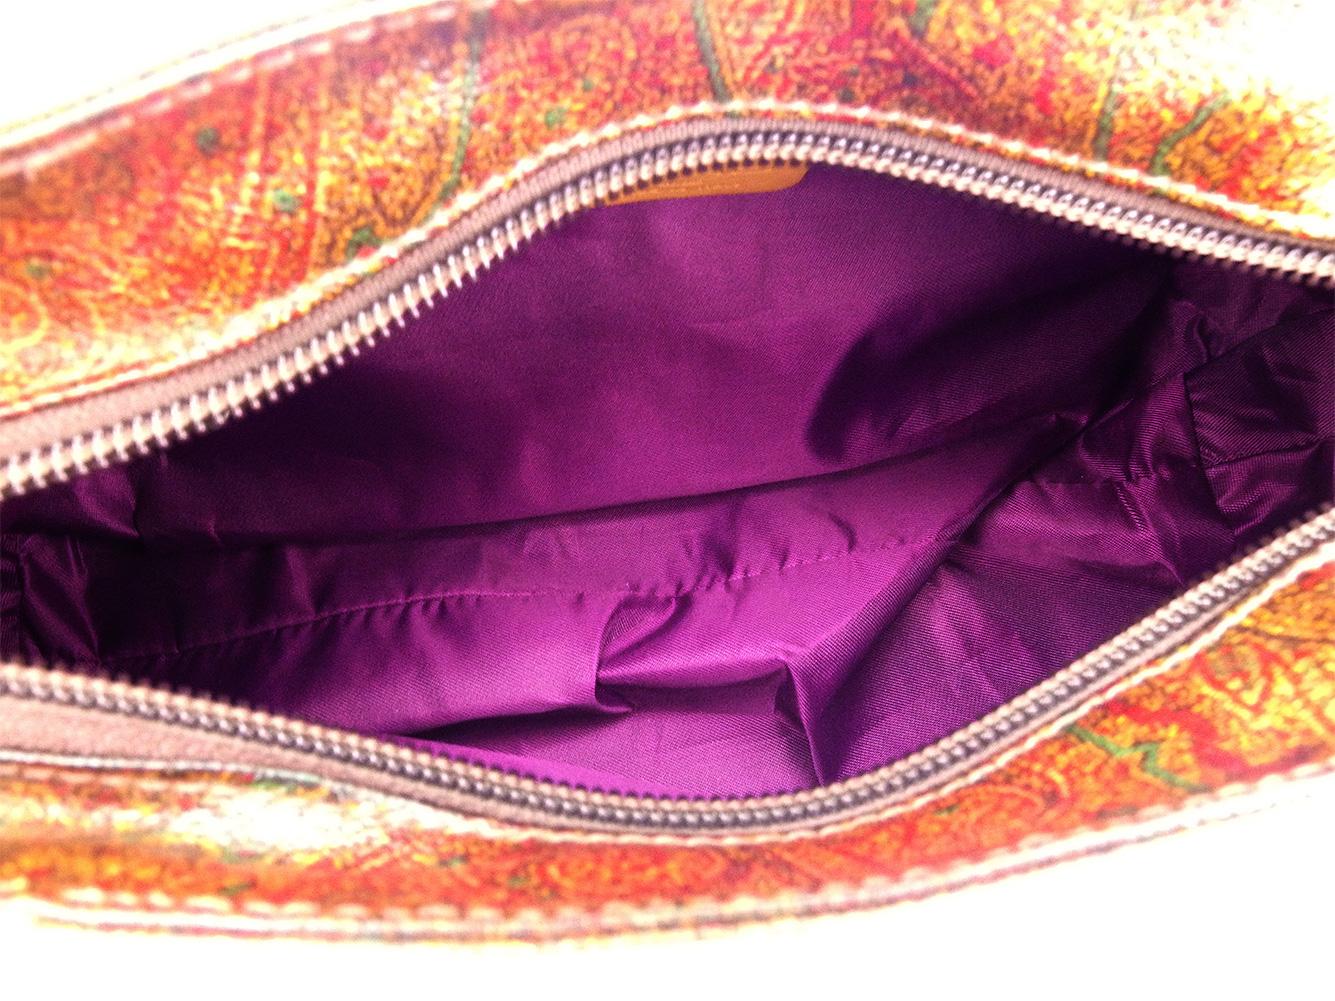 e5d3032a8 Beige silver PVC X leather popularity quality goods D2025 of エトロ ETRO  handbag shoulder bag Lady's men paisley Brown line